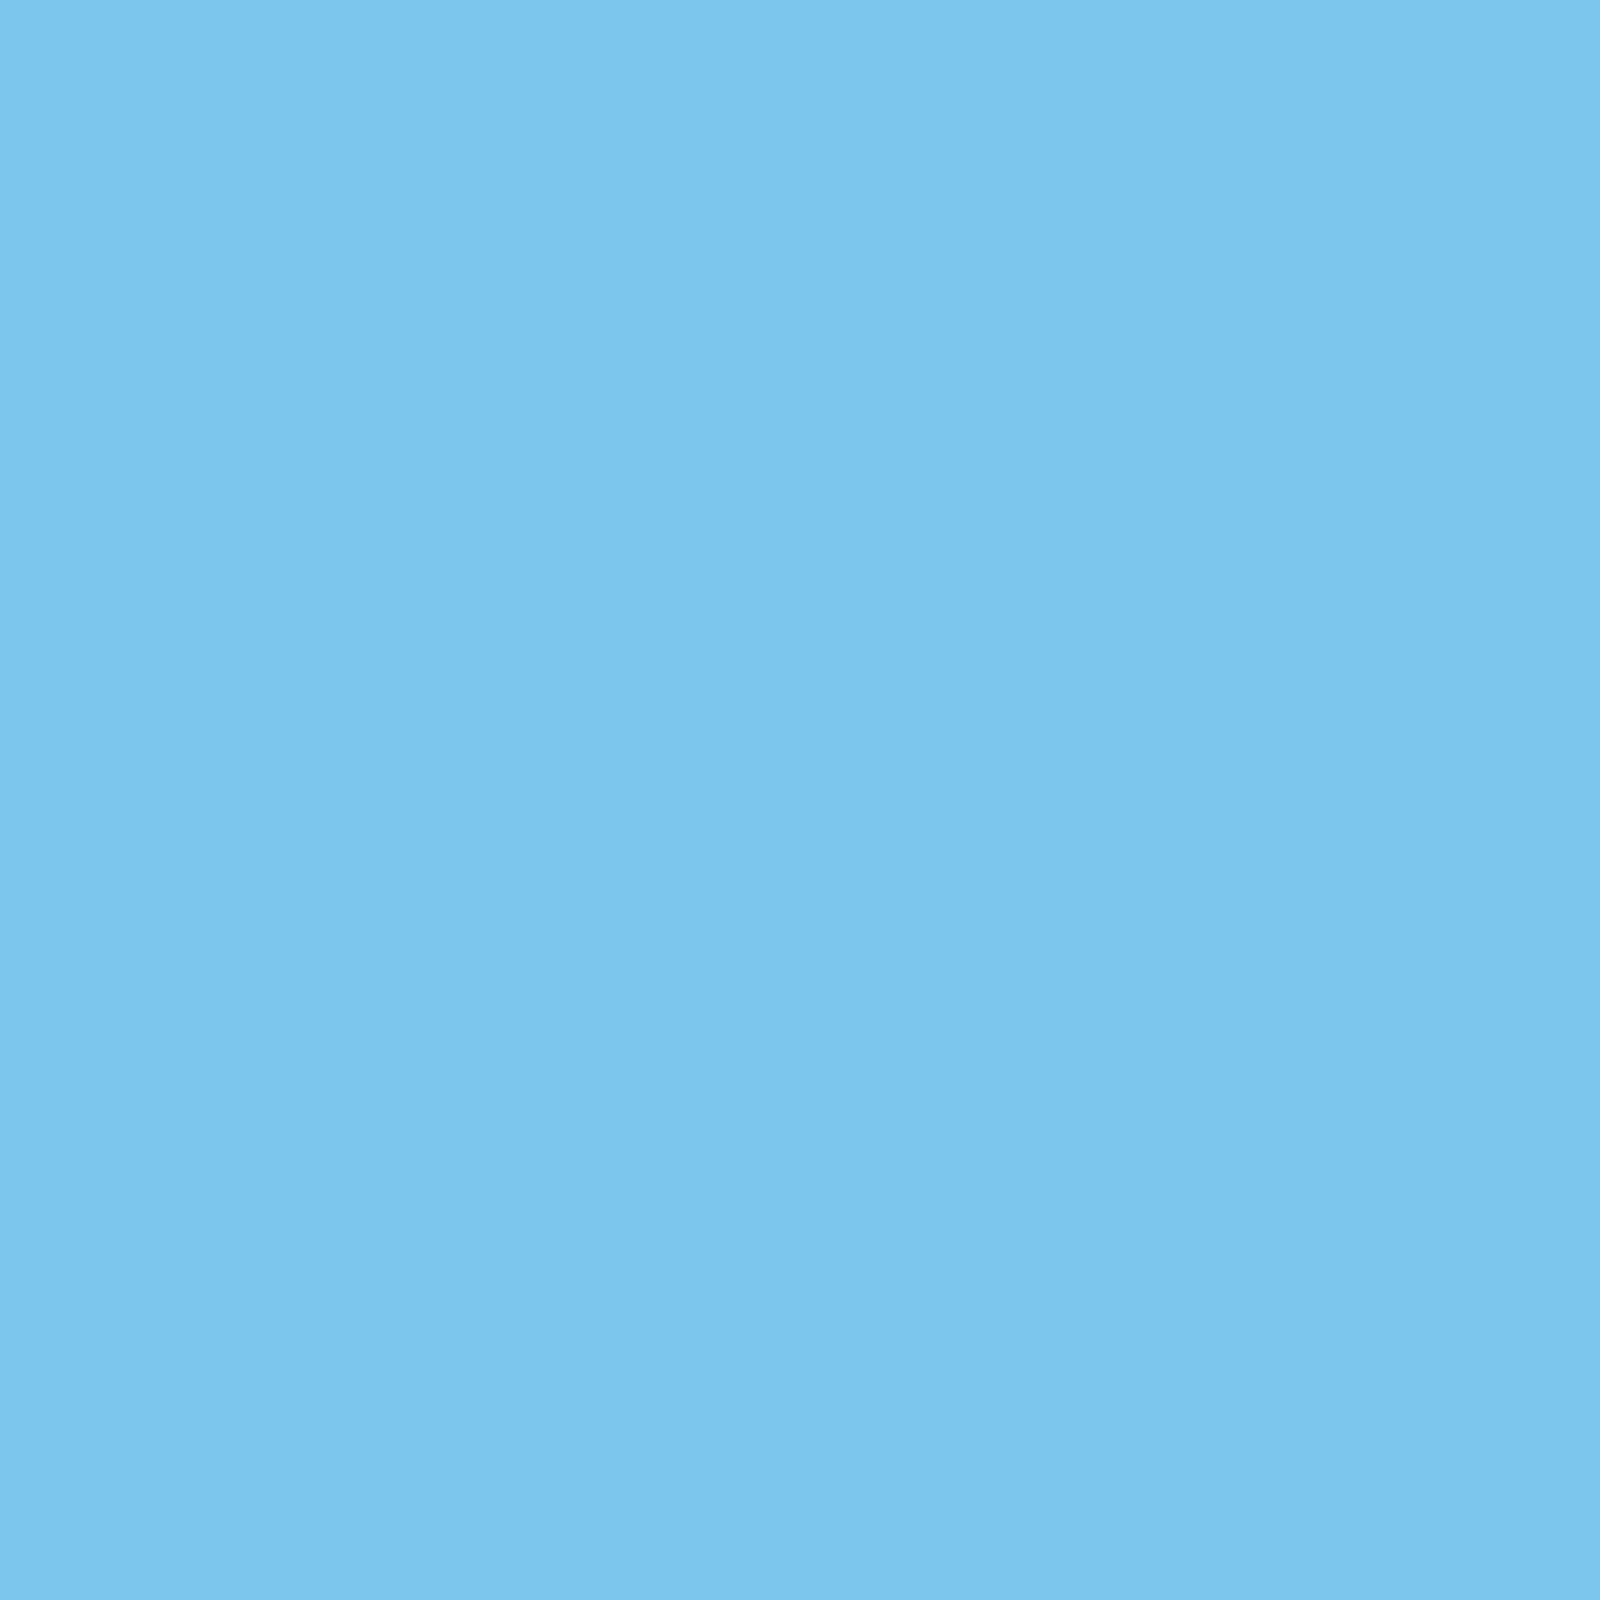 kobra albastru cer